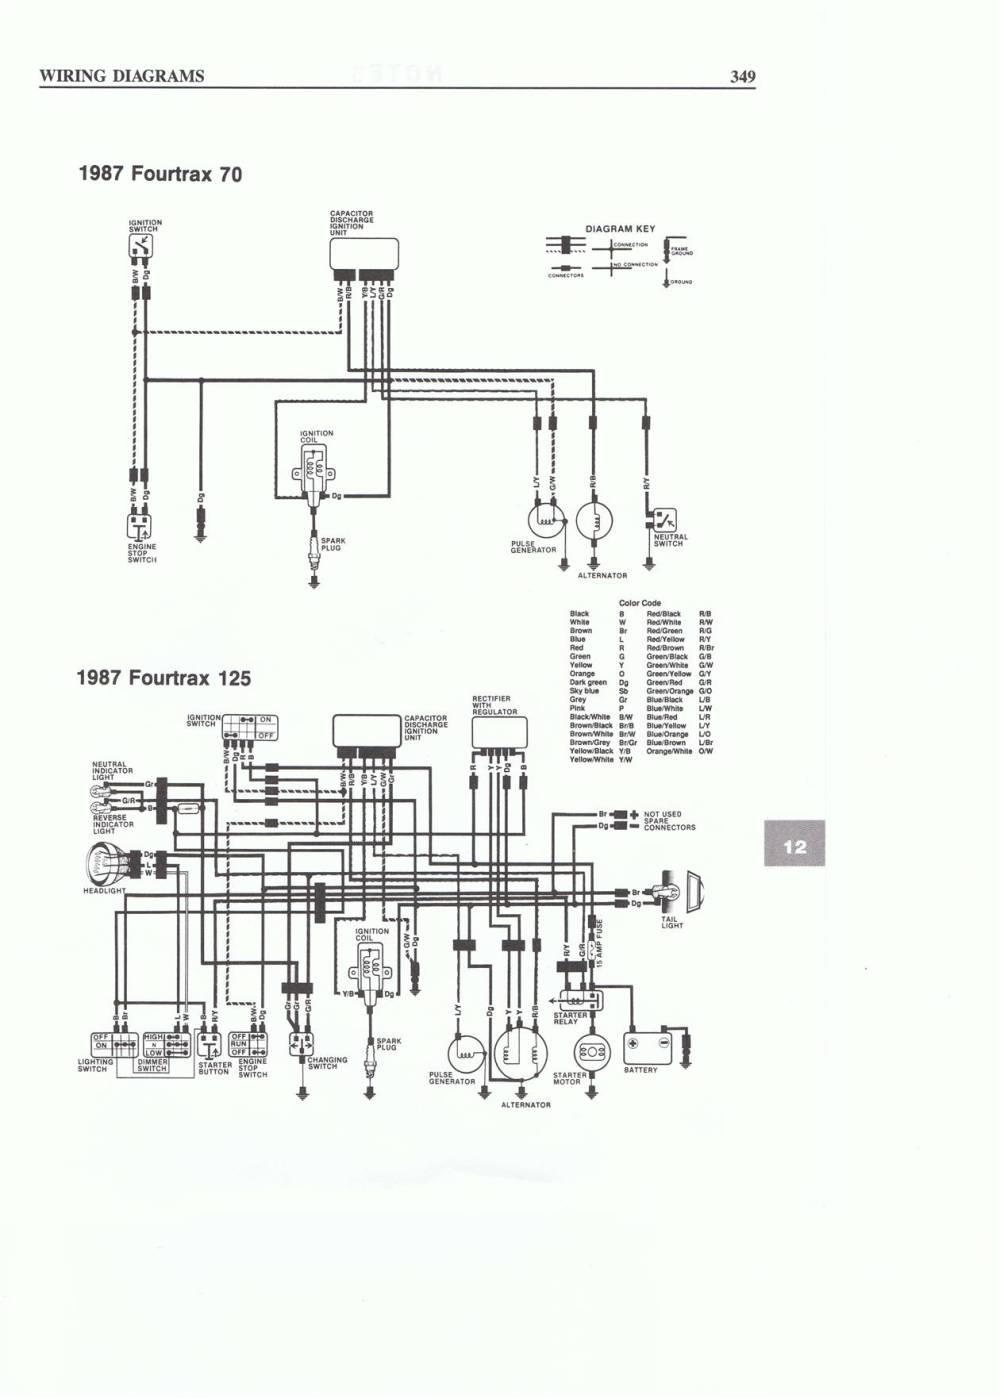 medium resolution of peace sports 110cc 4 wheeler wiring diagram peace get 90cc chinese atv wiring diagram tao tao 110 wiring diagram